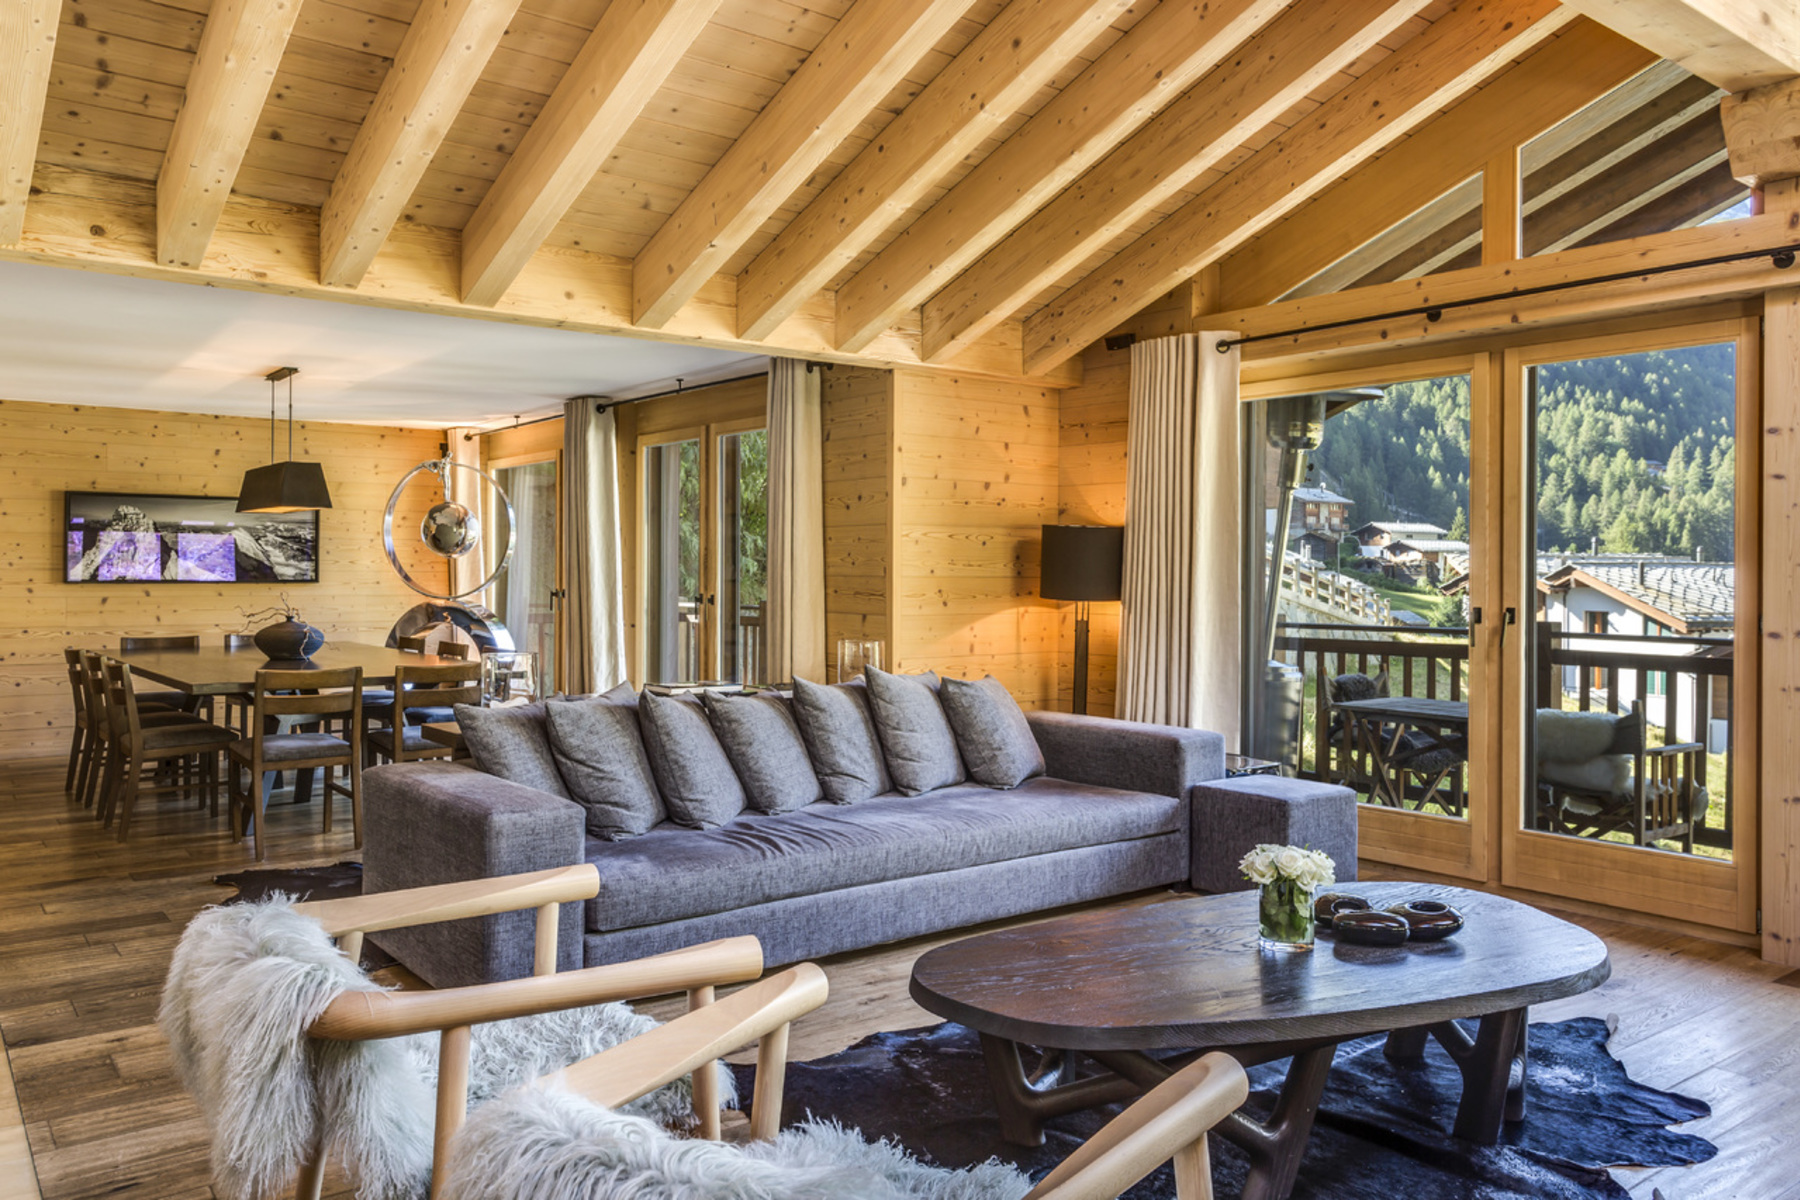 Single Family Homes for Sale at Free standing high-class chalet on 4 floors Zermatt, Valais 3920 Switzerland